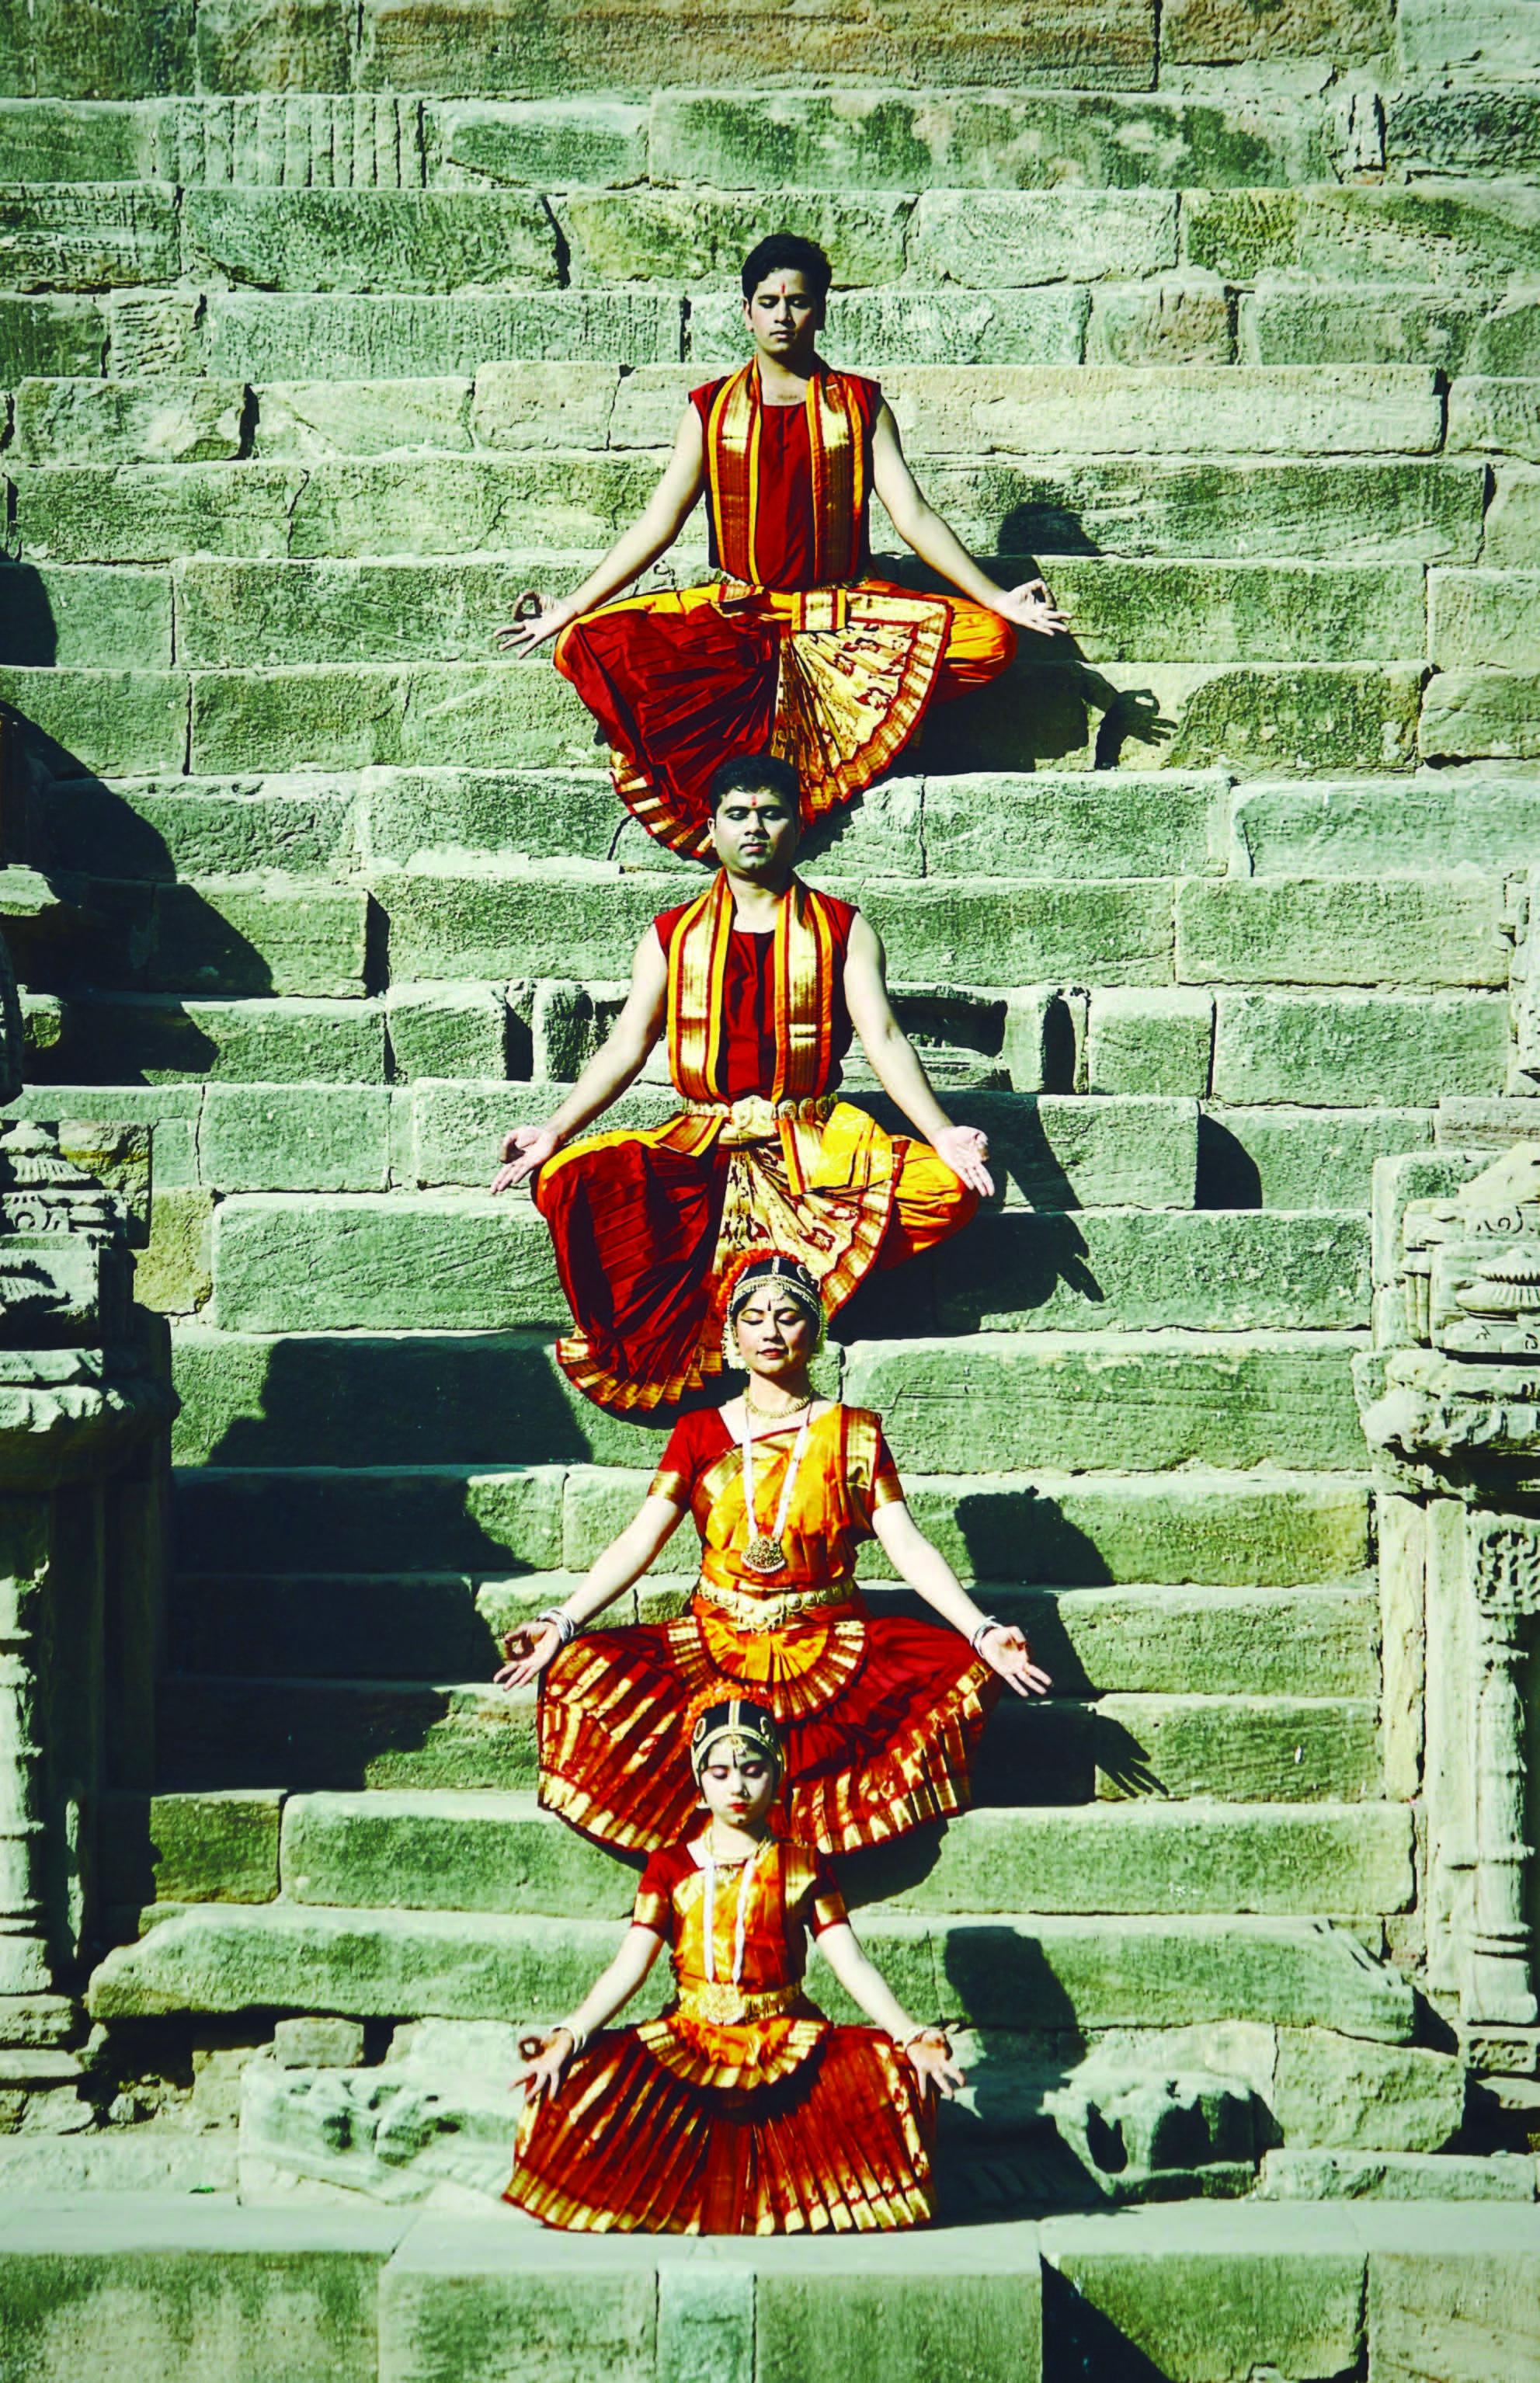 Photograph by Arushi Saini. Gujarat, India